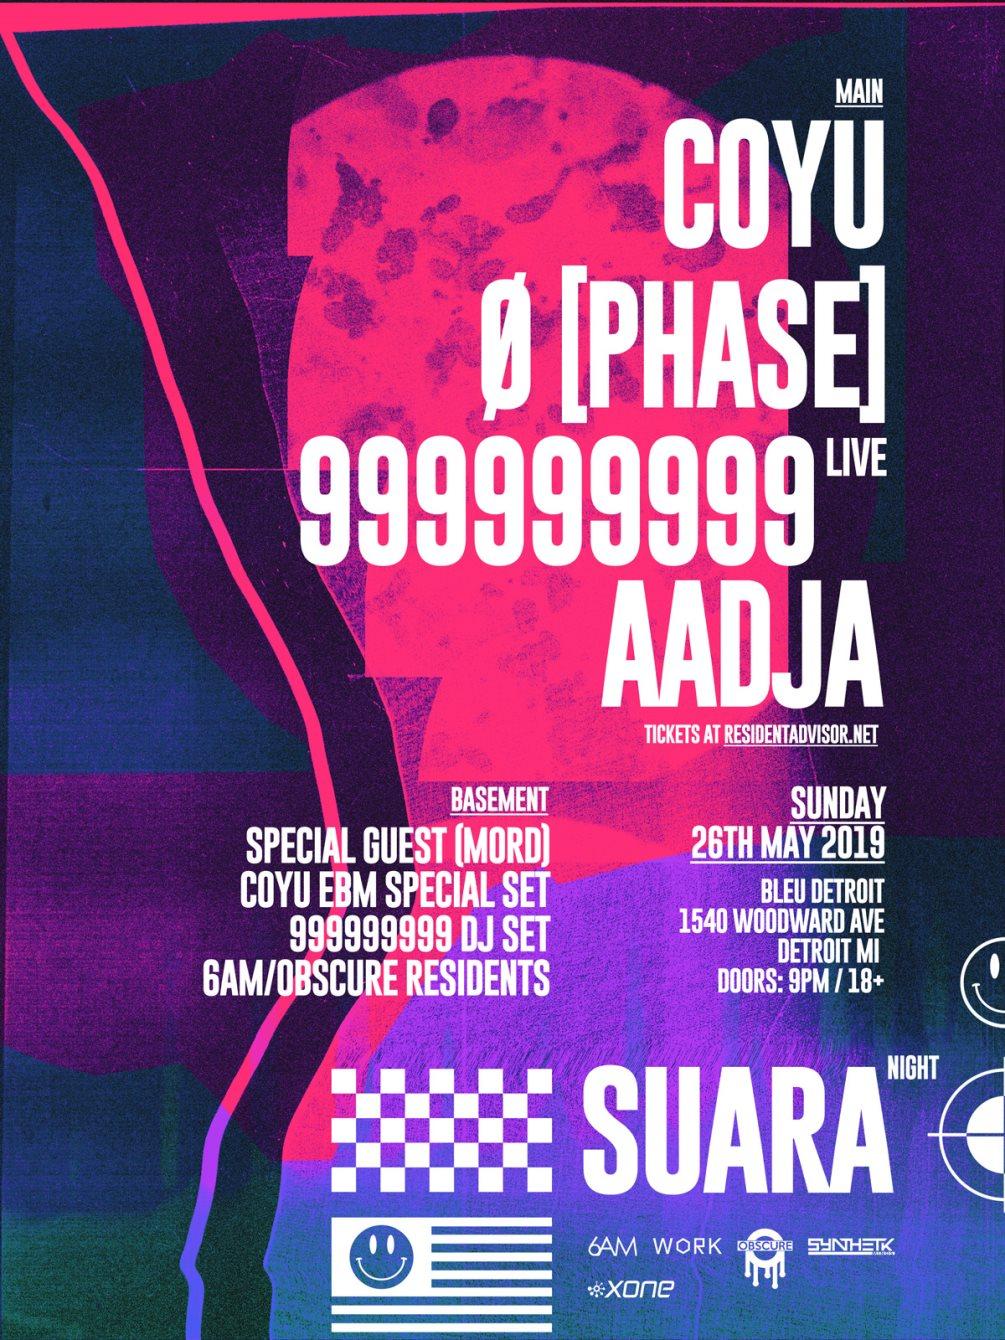 Suara Night Detroit: Coyu, Ø [Phase], 999999999 (Live), AADJA - Flyer front